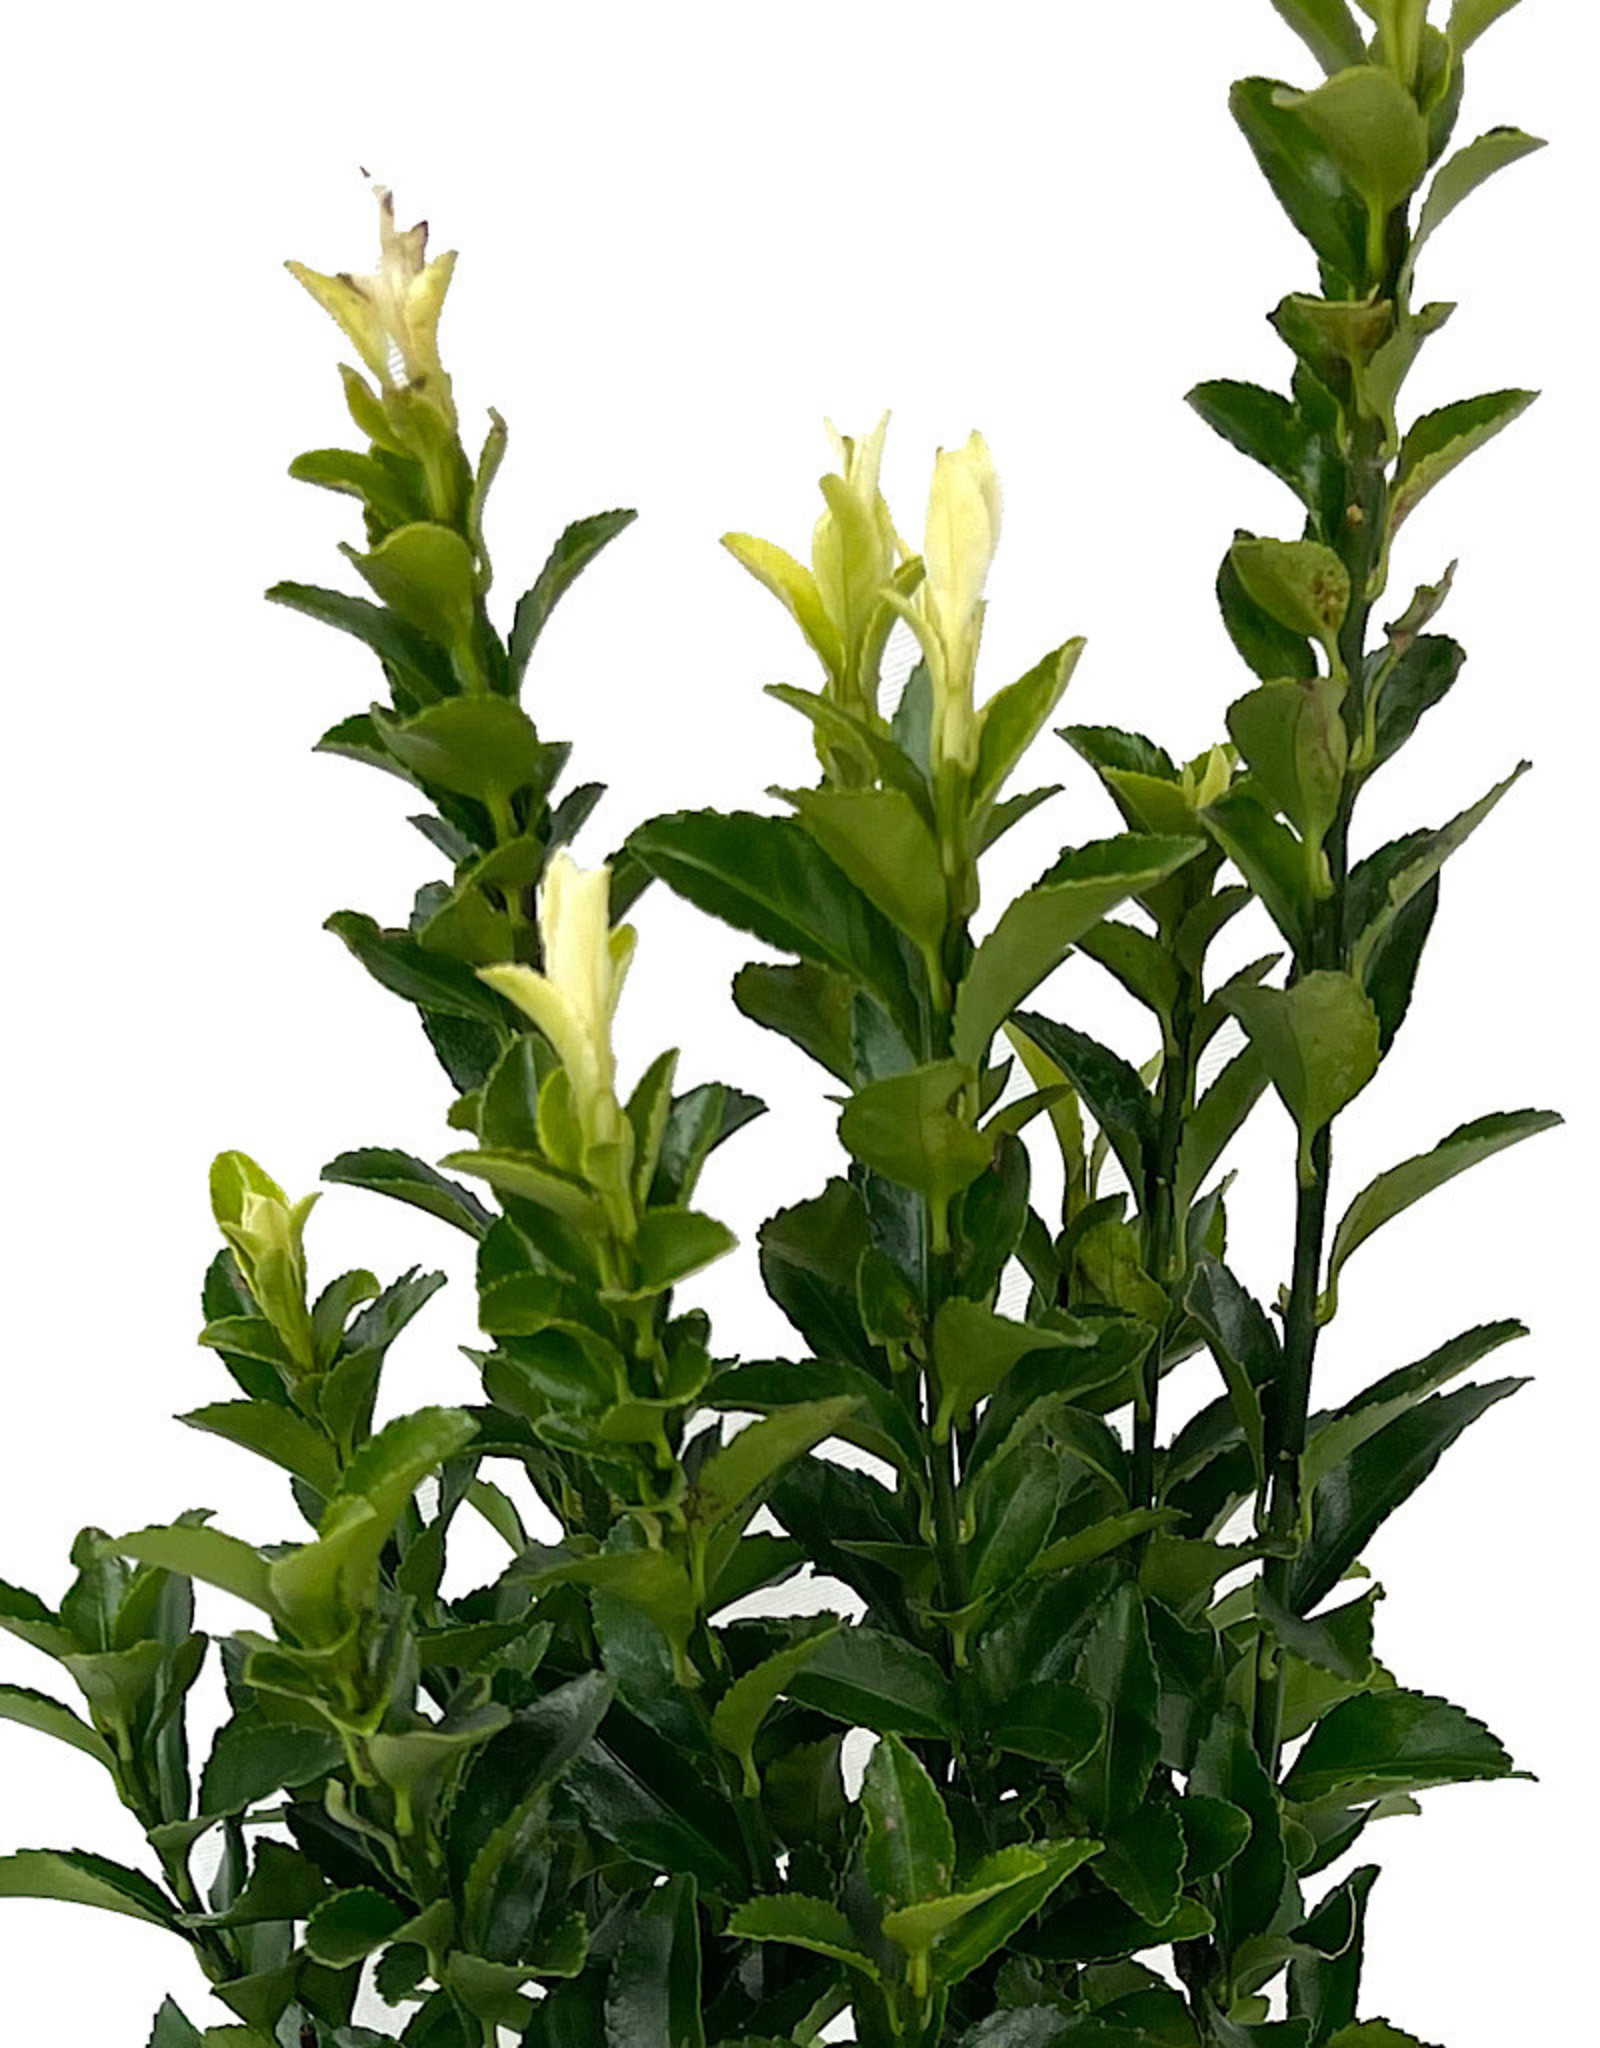 Euonymus japonicus 'Paloma Blanca' Quart